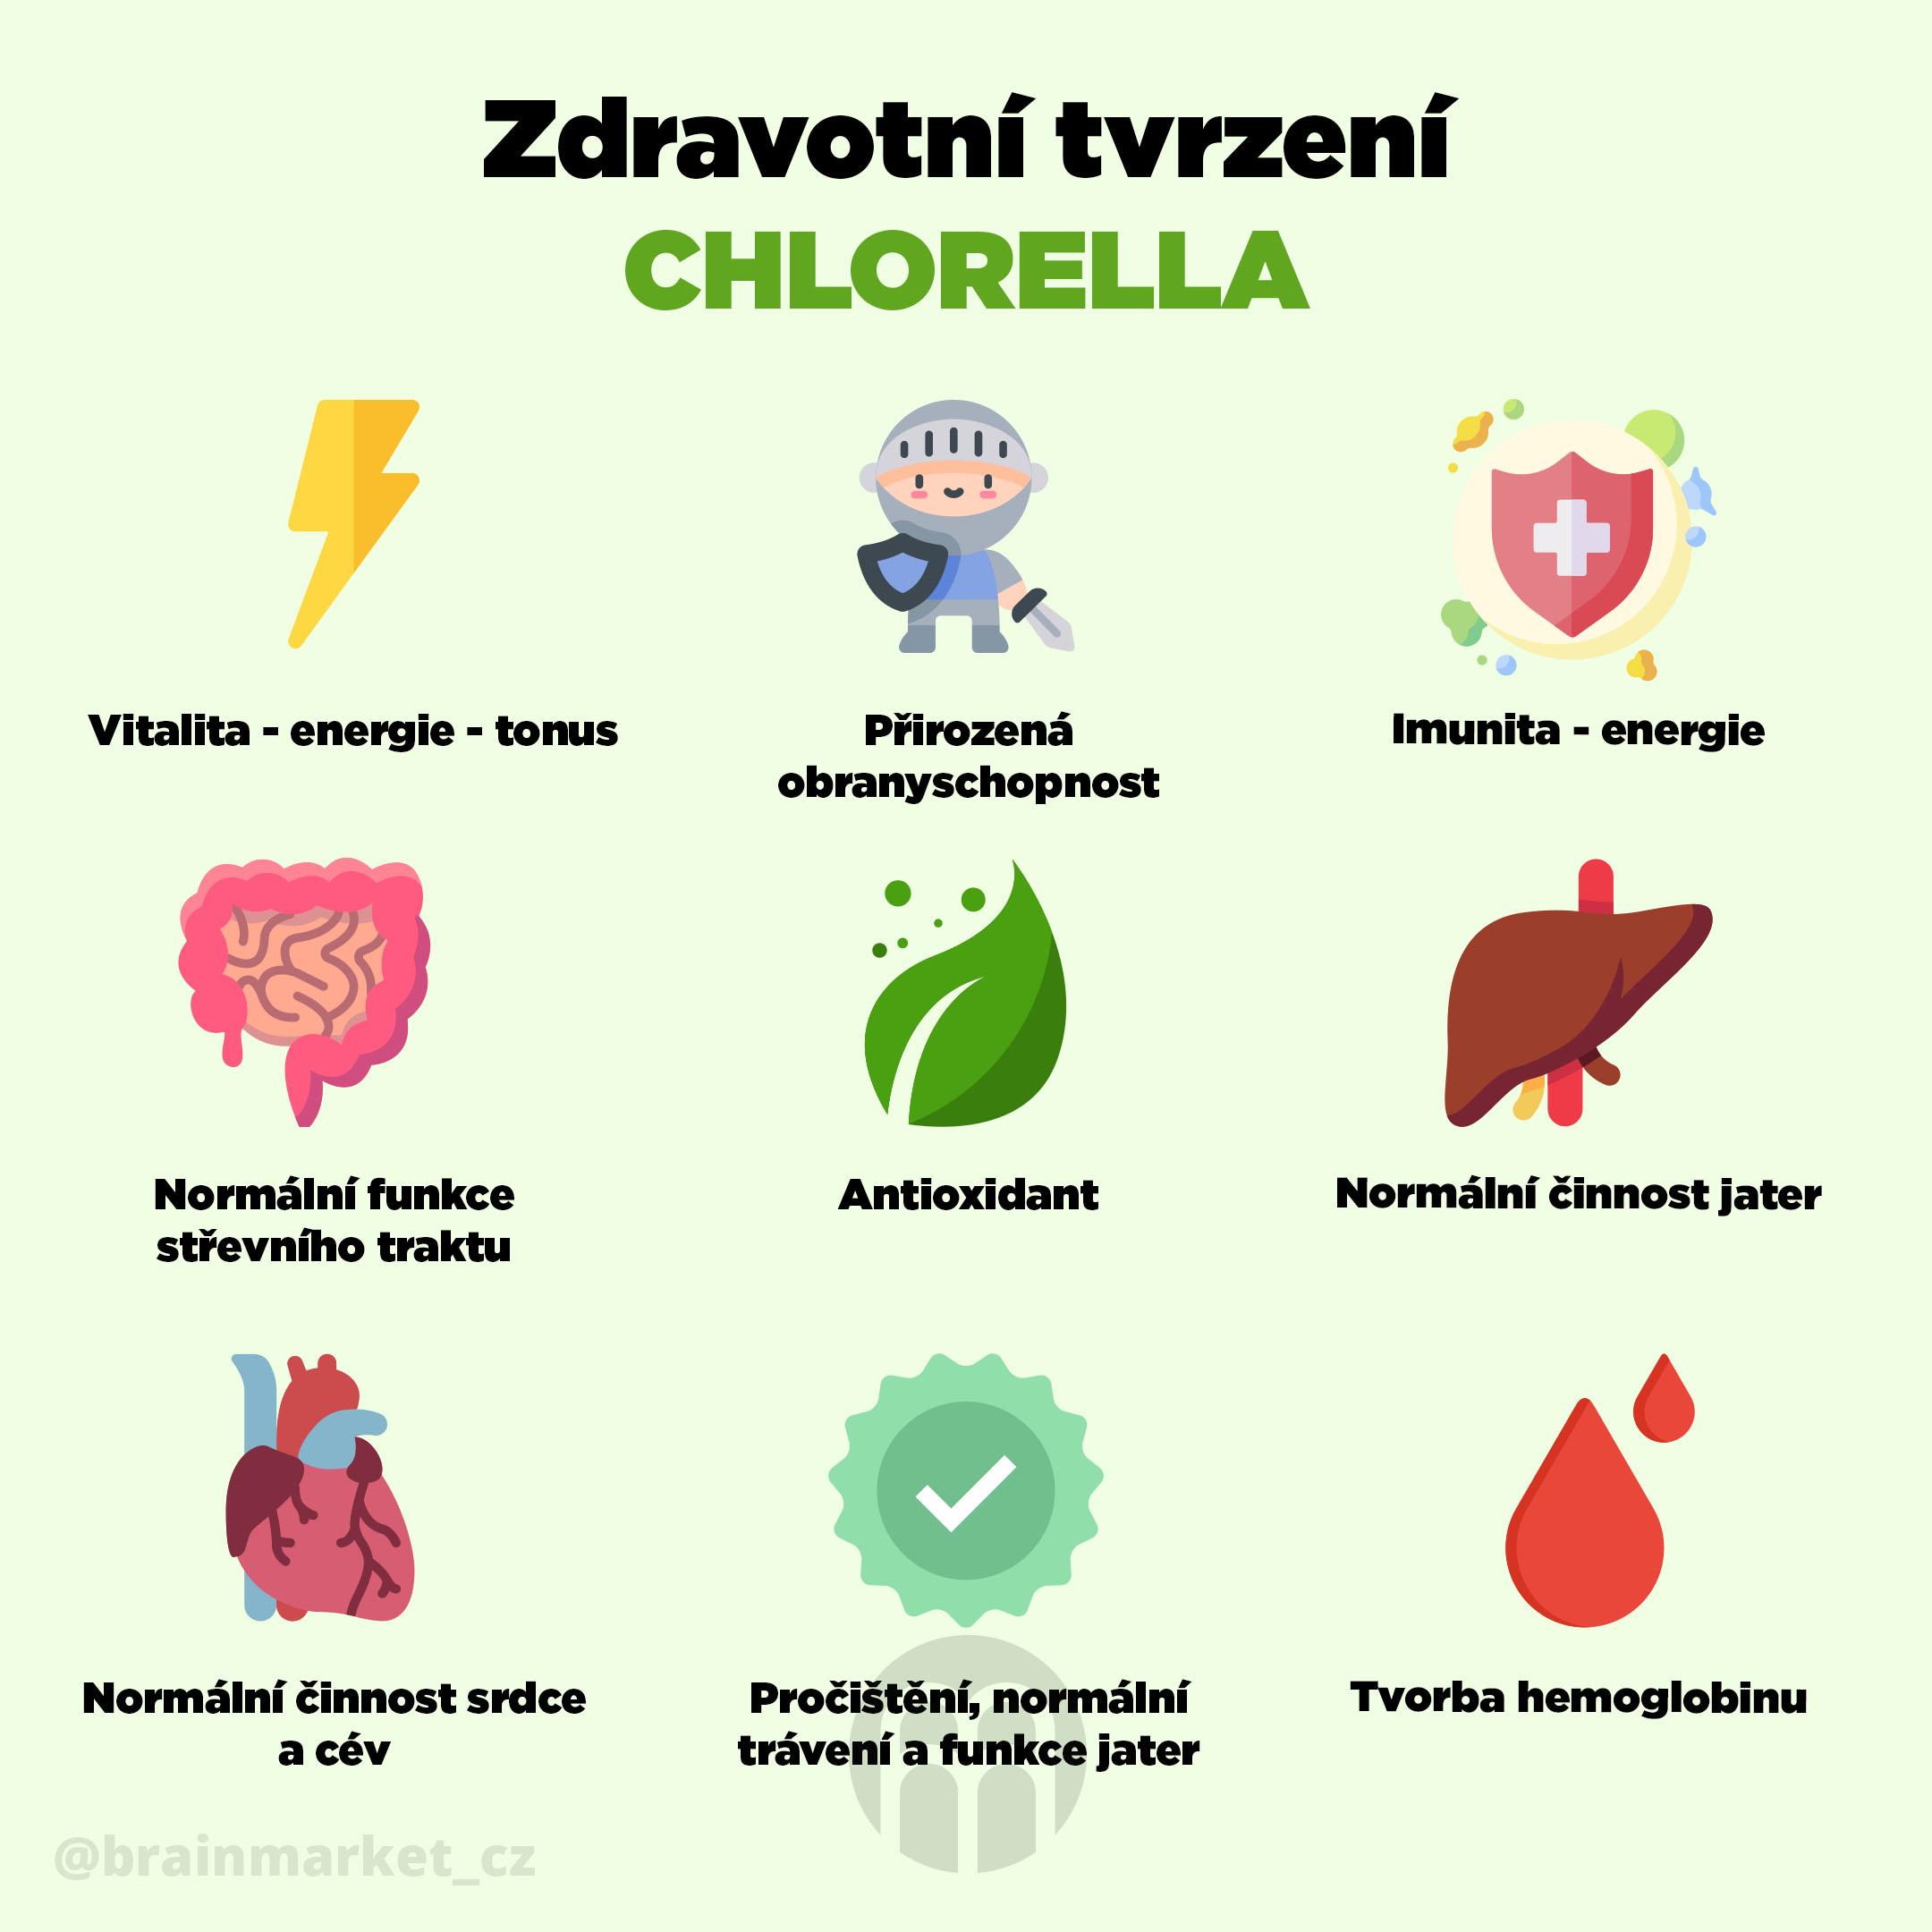 zdravotni-tvrzeni-chlorella-infografika-brainmarket-cz